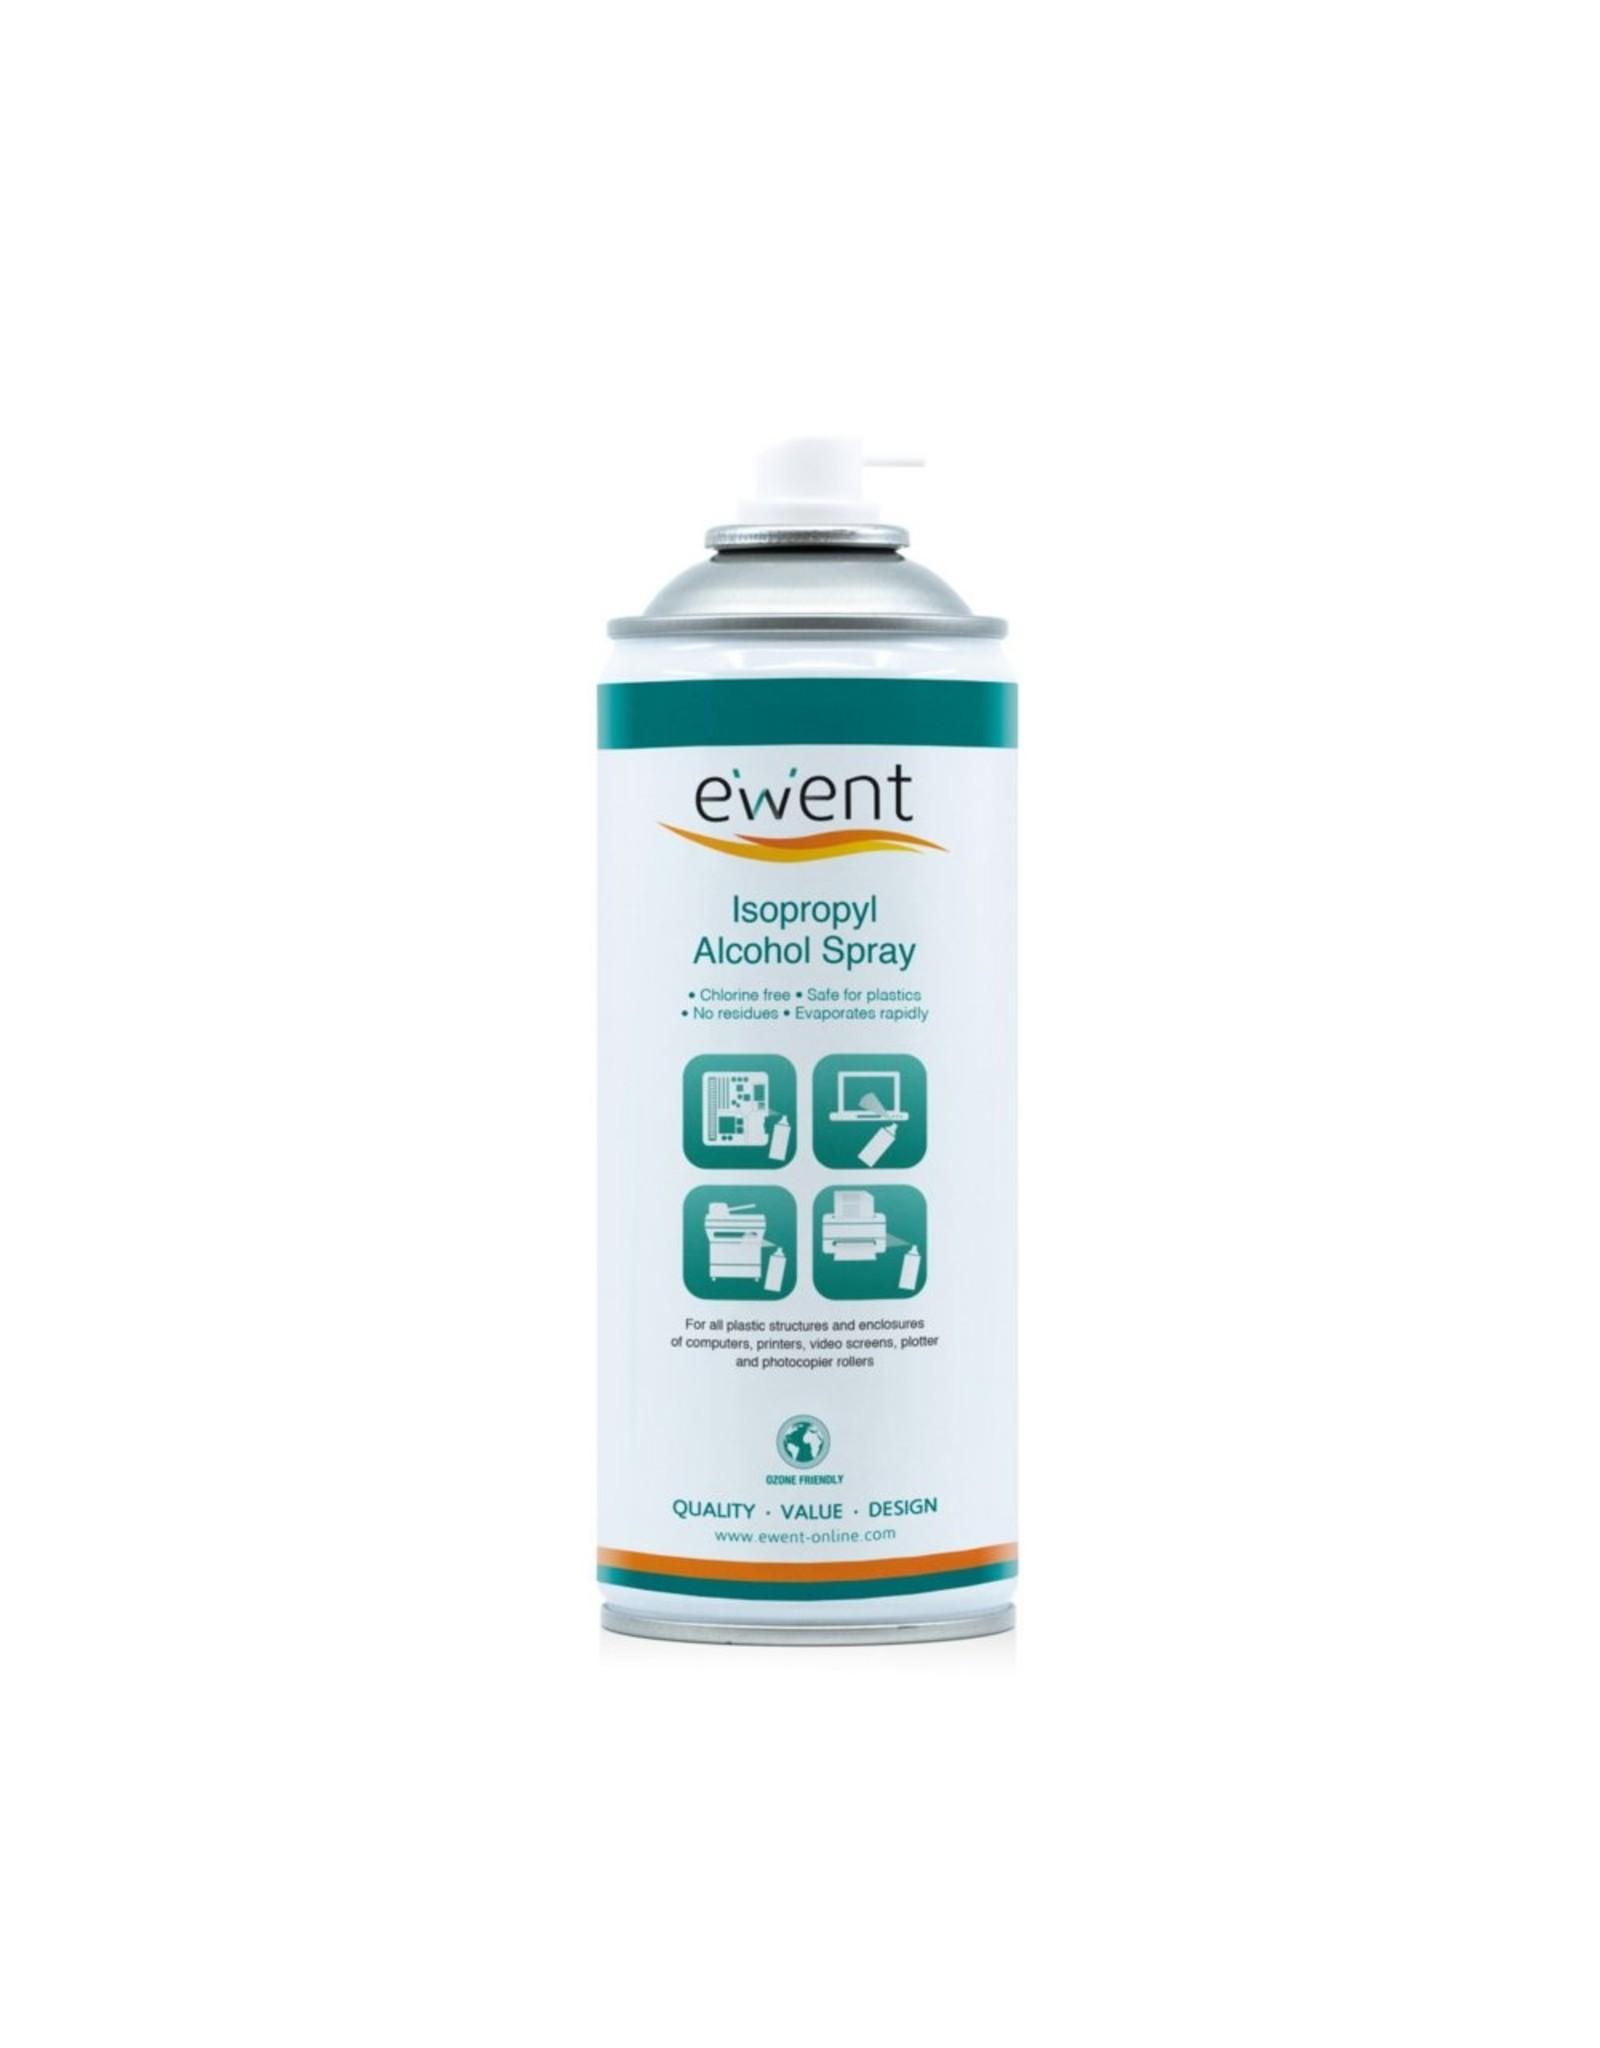 Ewent Isopropyl Alcohol Spray 400 ml